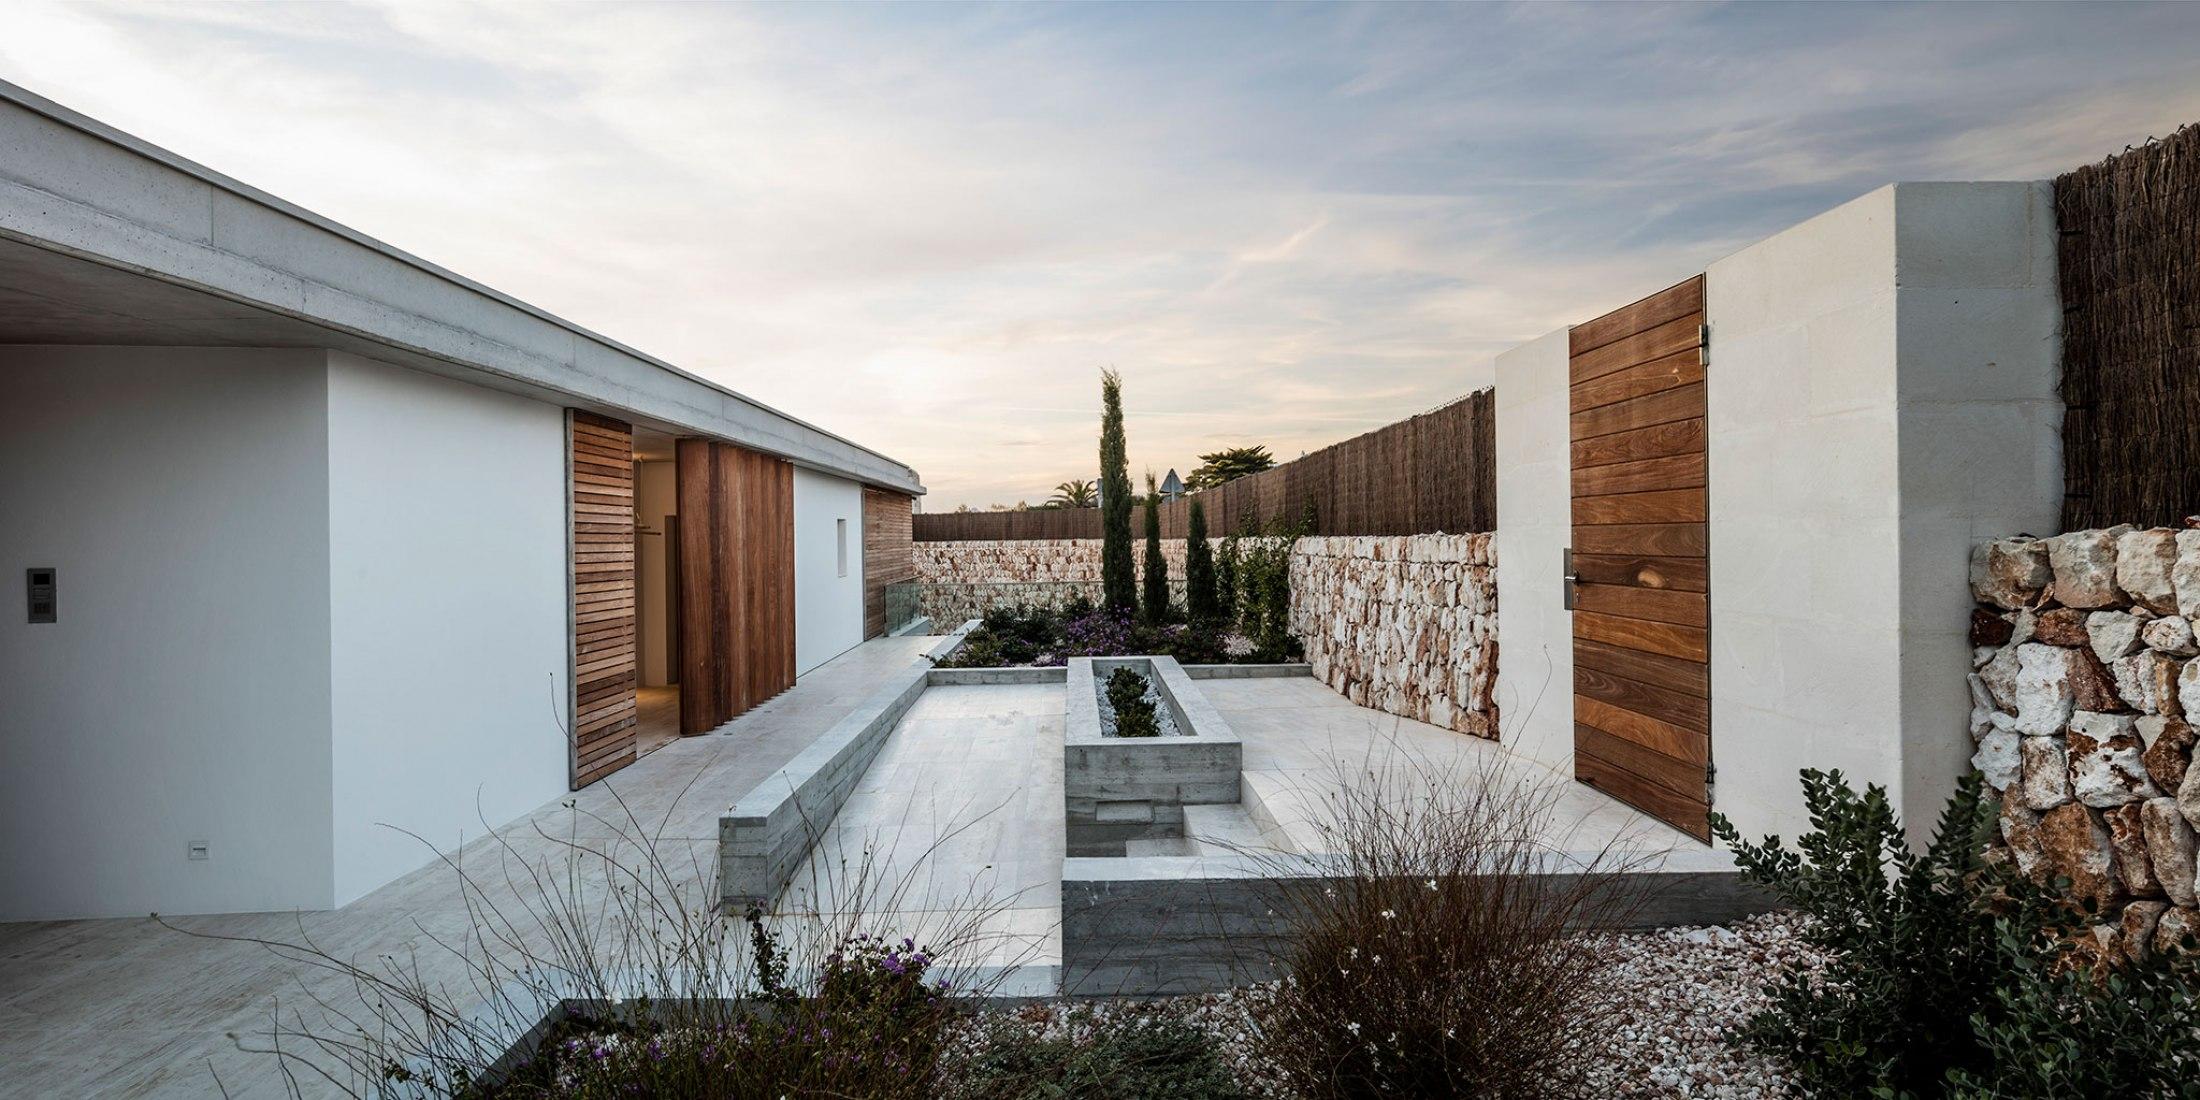 Casa E por Gabriel Montañés. Fotografía por Adrià Goula